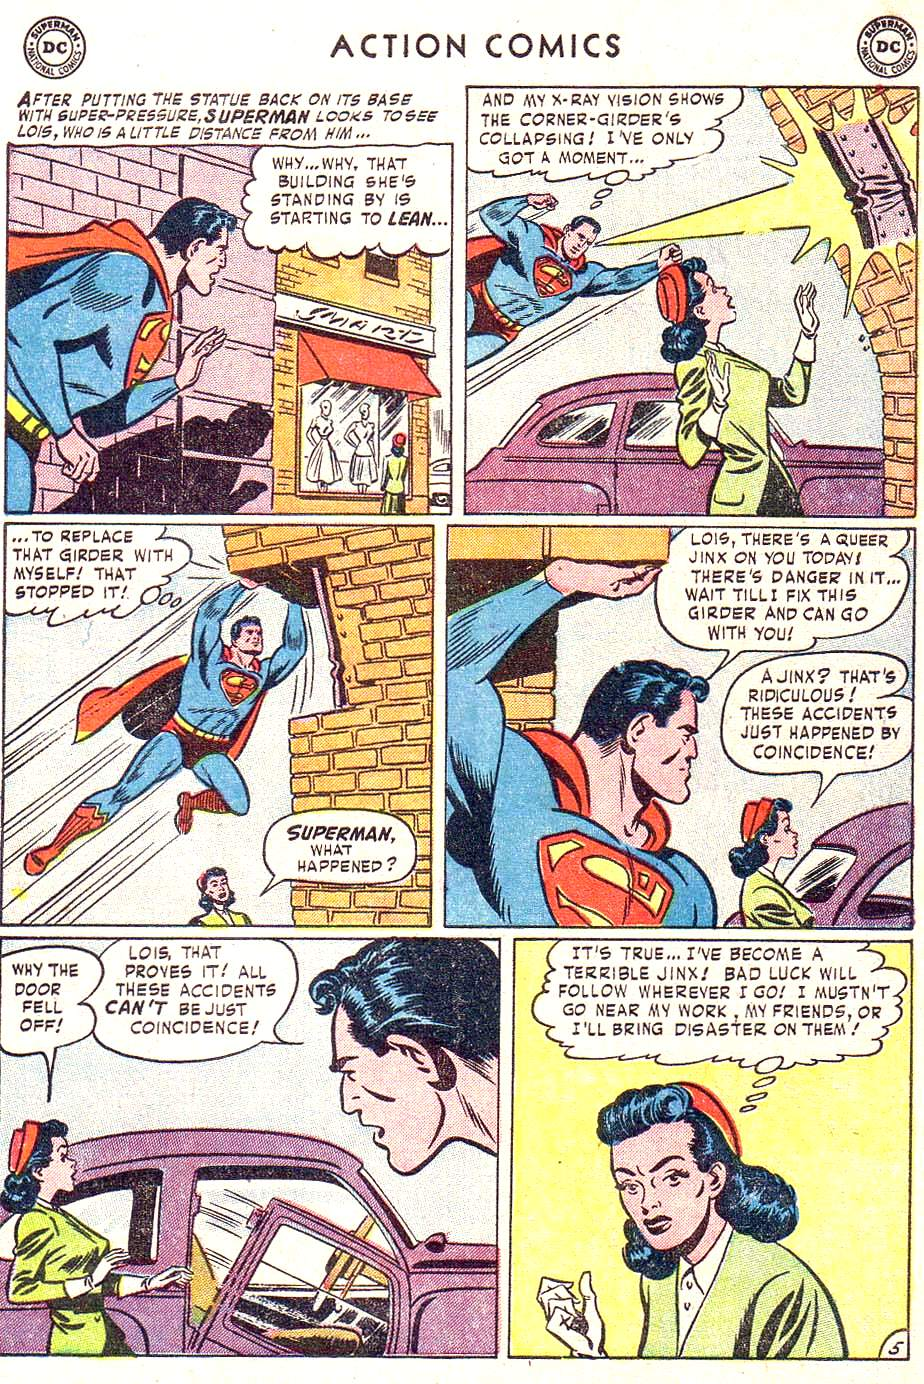 Action Comics (1938) 172 Page 6